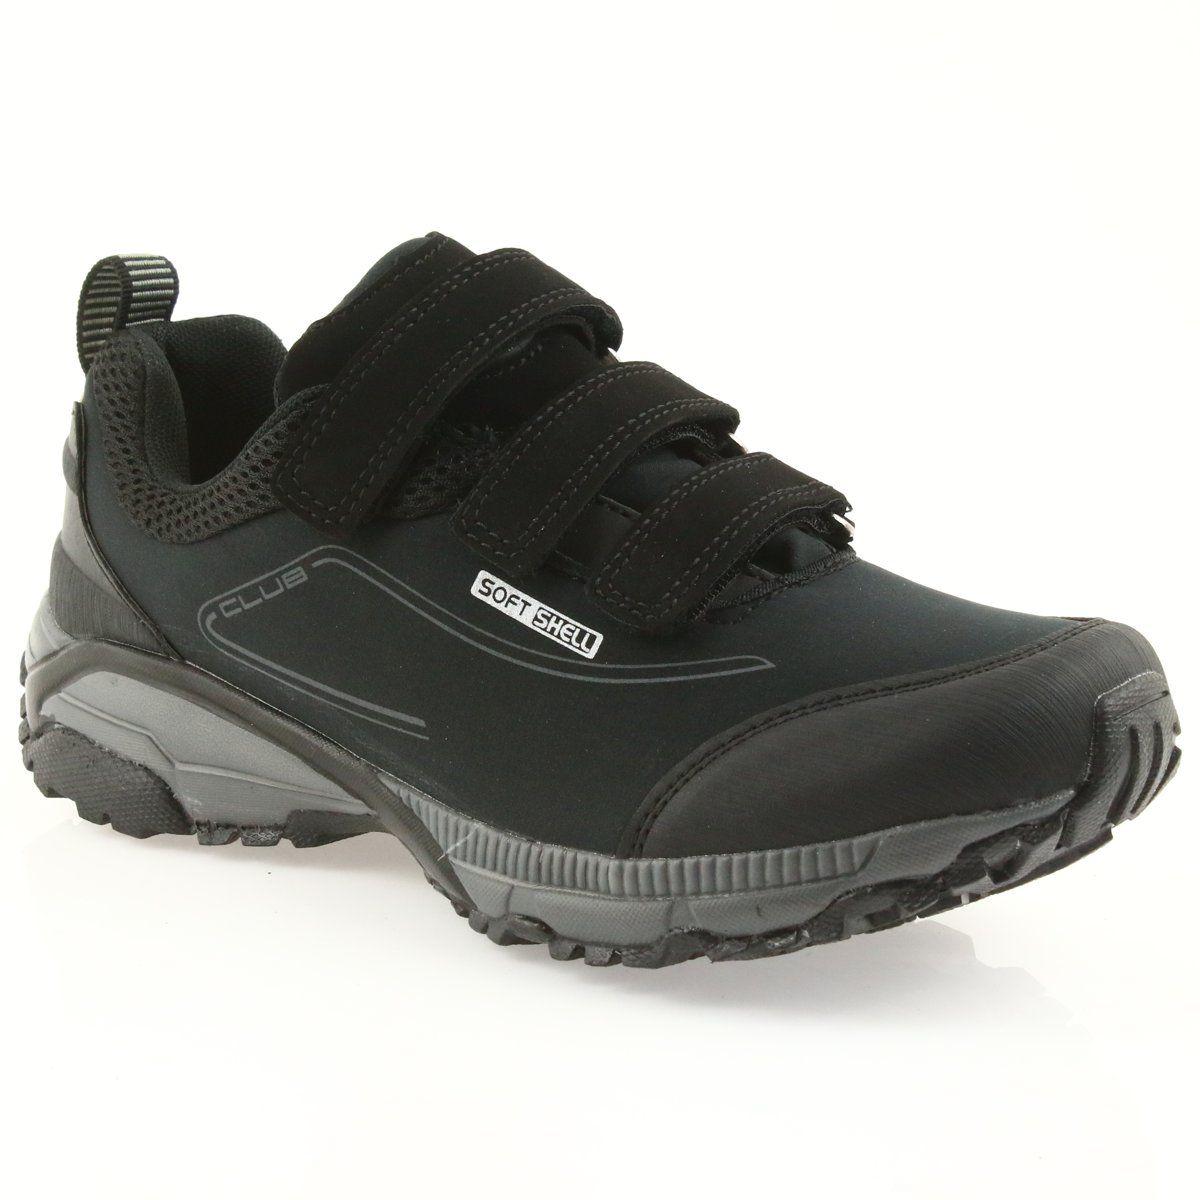 American Club Adi Buty Damskie Sportowe Na Rzepy American Wodoodporne Softhell Wt08 19 Czarne Sport Shoes Women Trekking Shoes Club Shoes